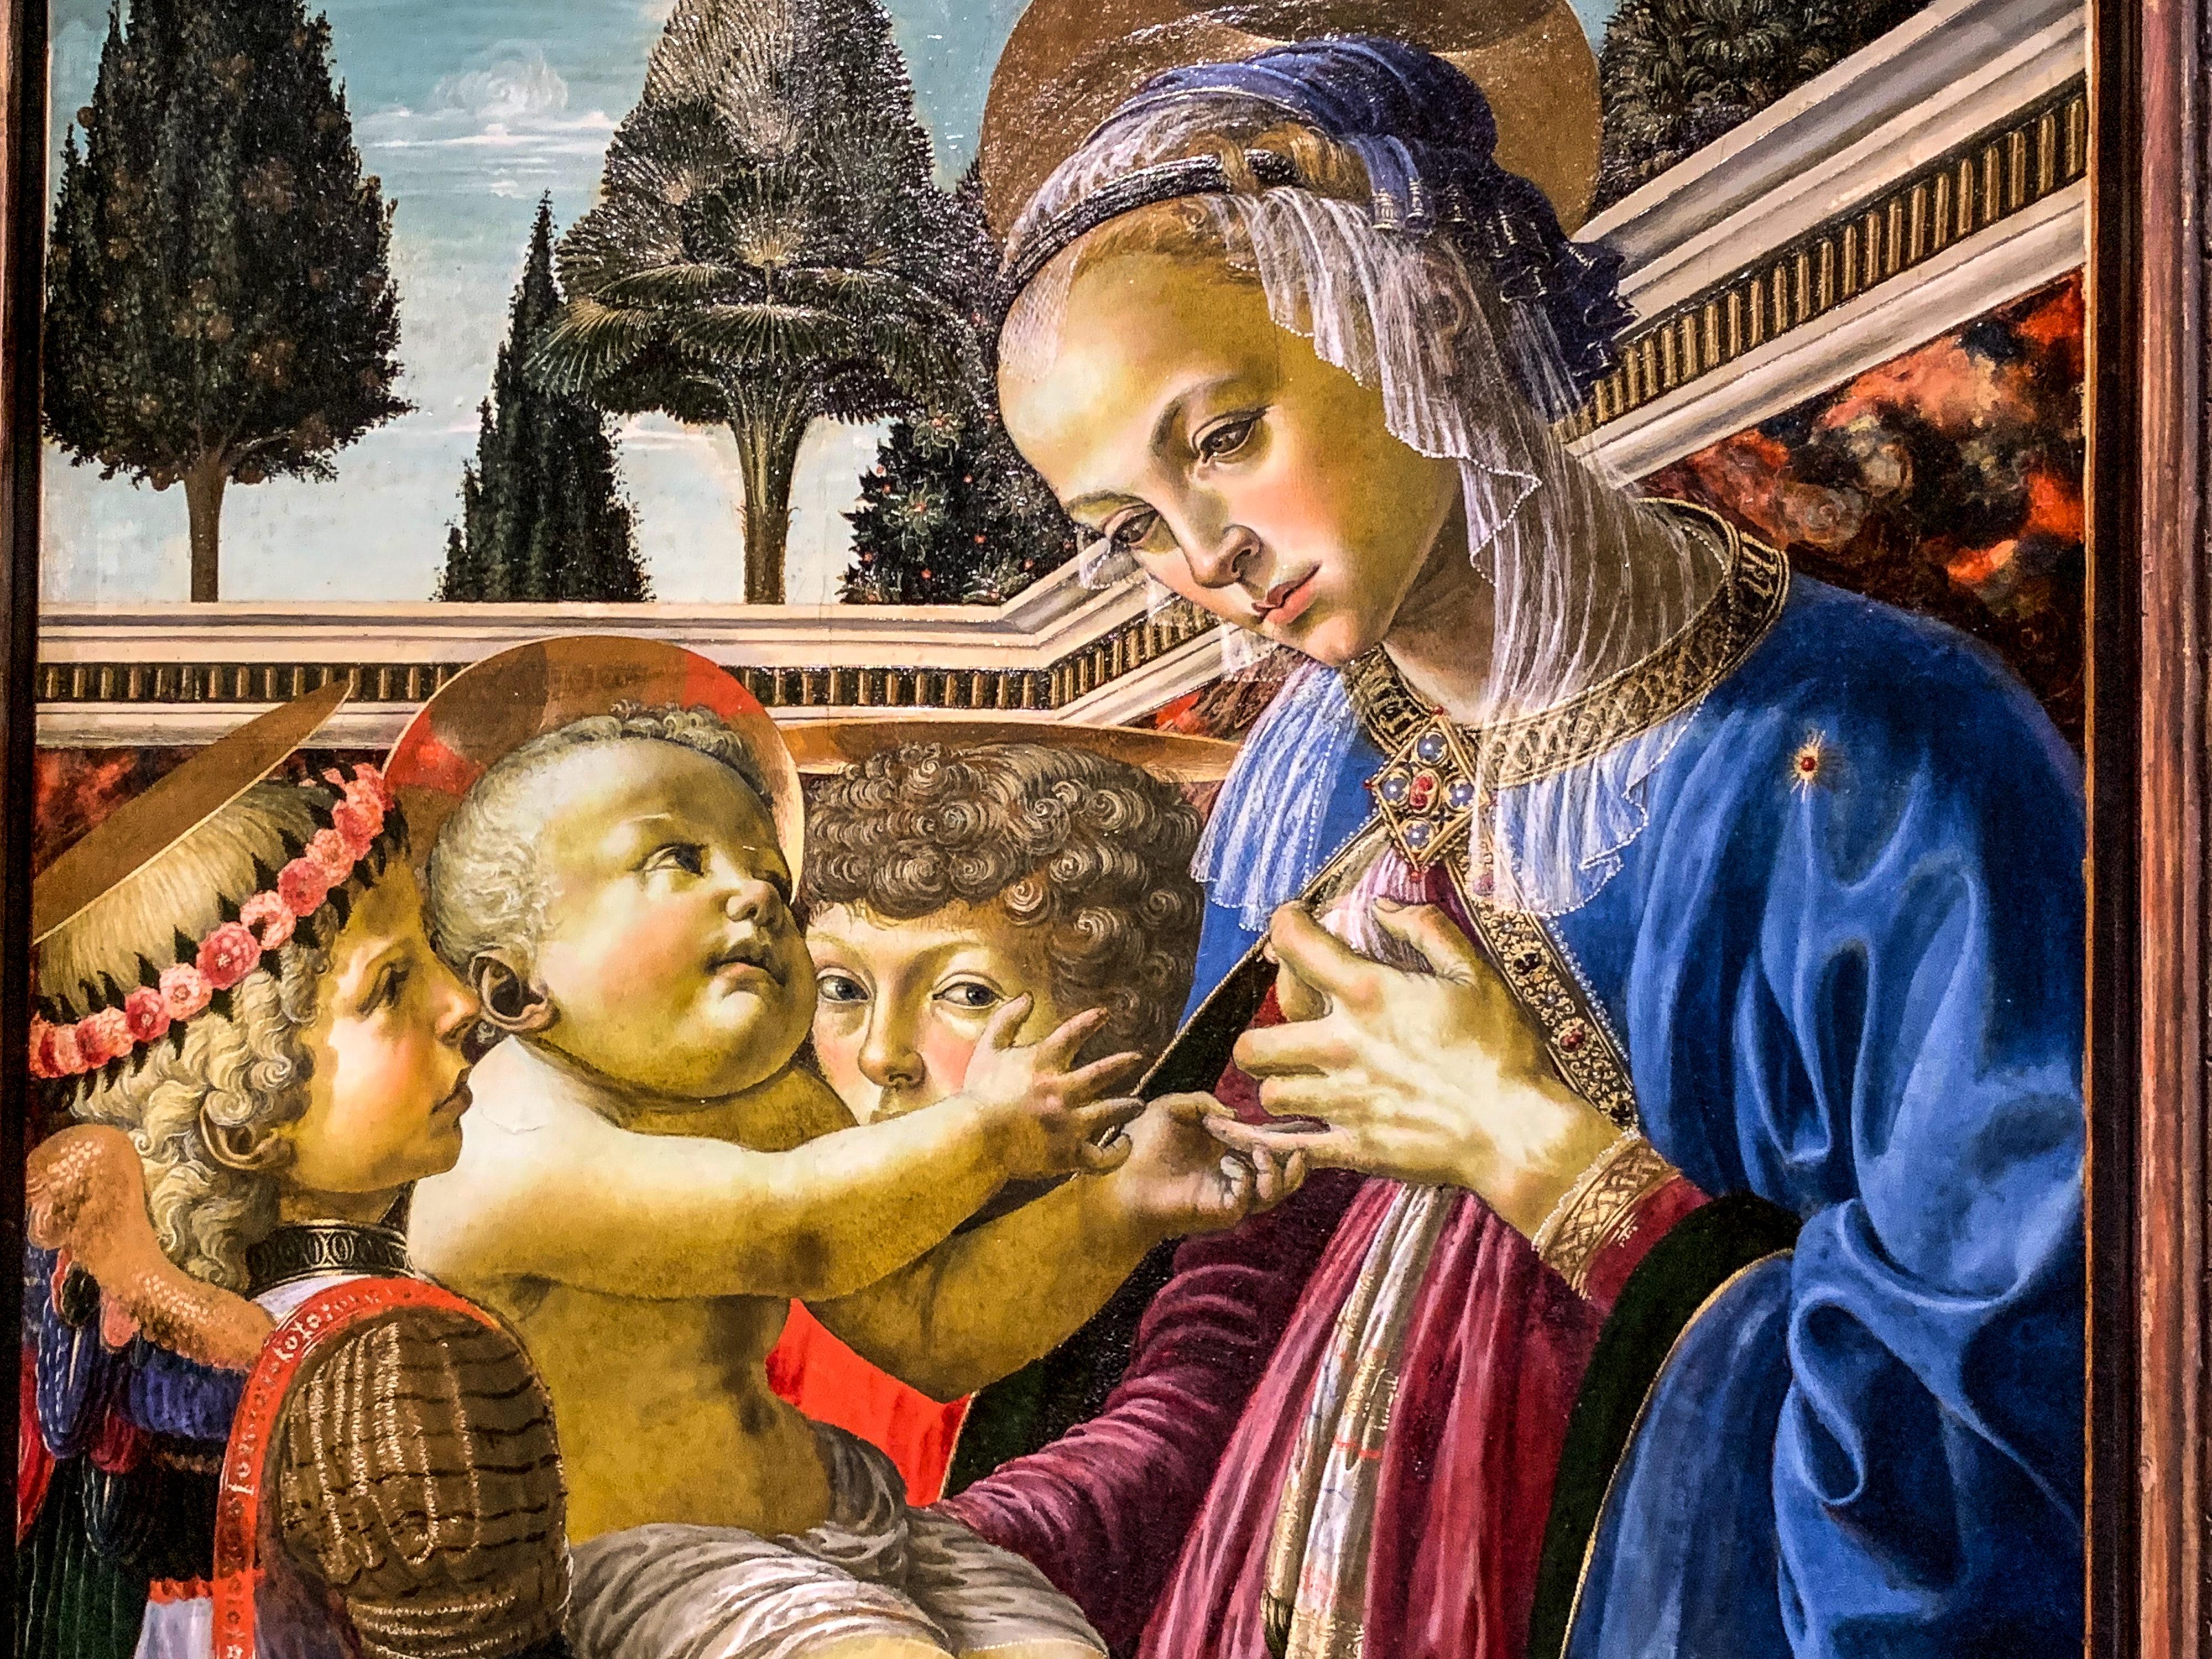 Verrocchio, Leonardo, Fra Bartolommeo Madonna London